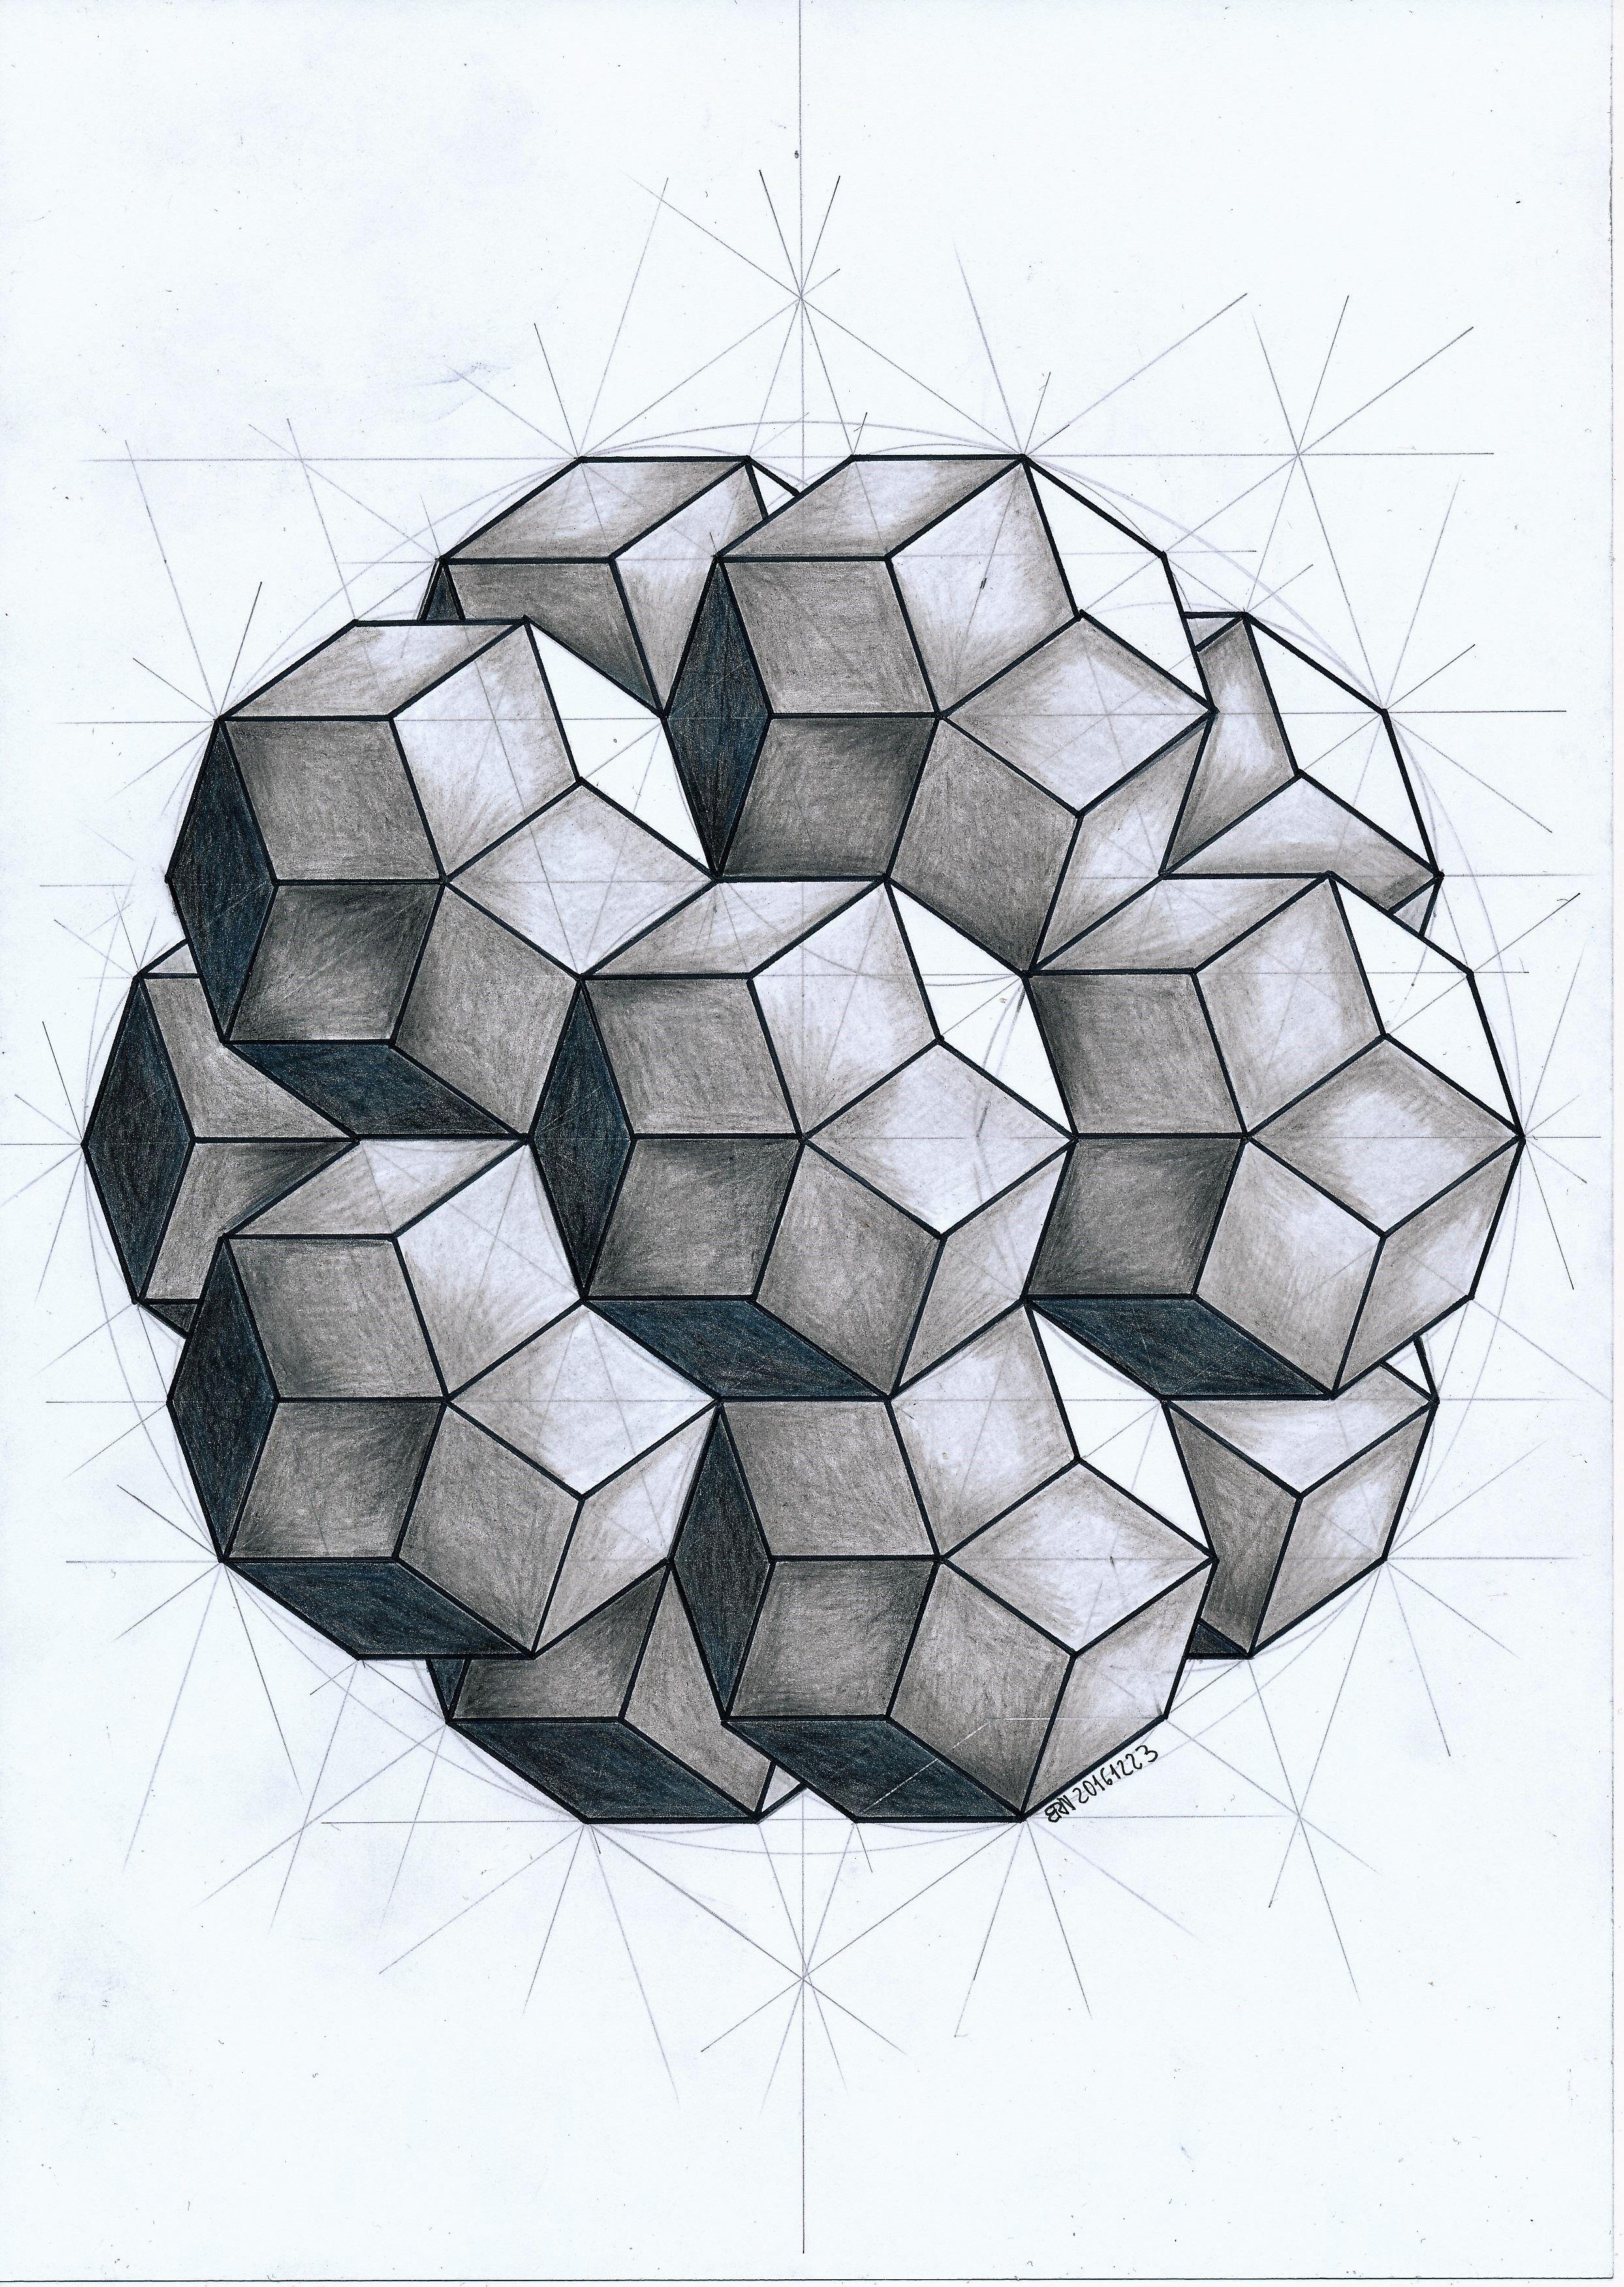 Solid Polyhedra Geometry Symmetry Pattern Handmade Regolo54 Mathart Escher Pencil Pentagon Star Arte De Geometria Arte Geometrico Geometria